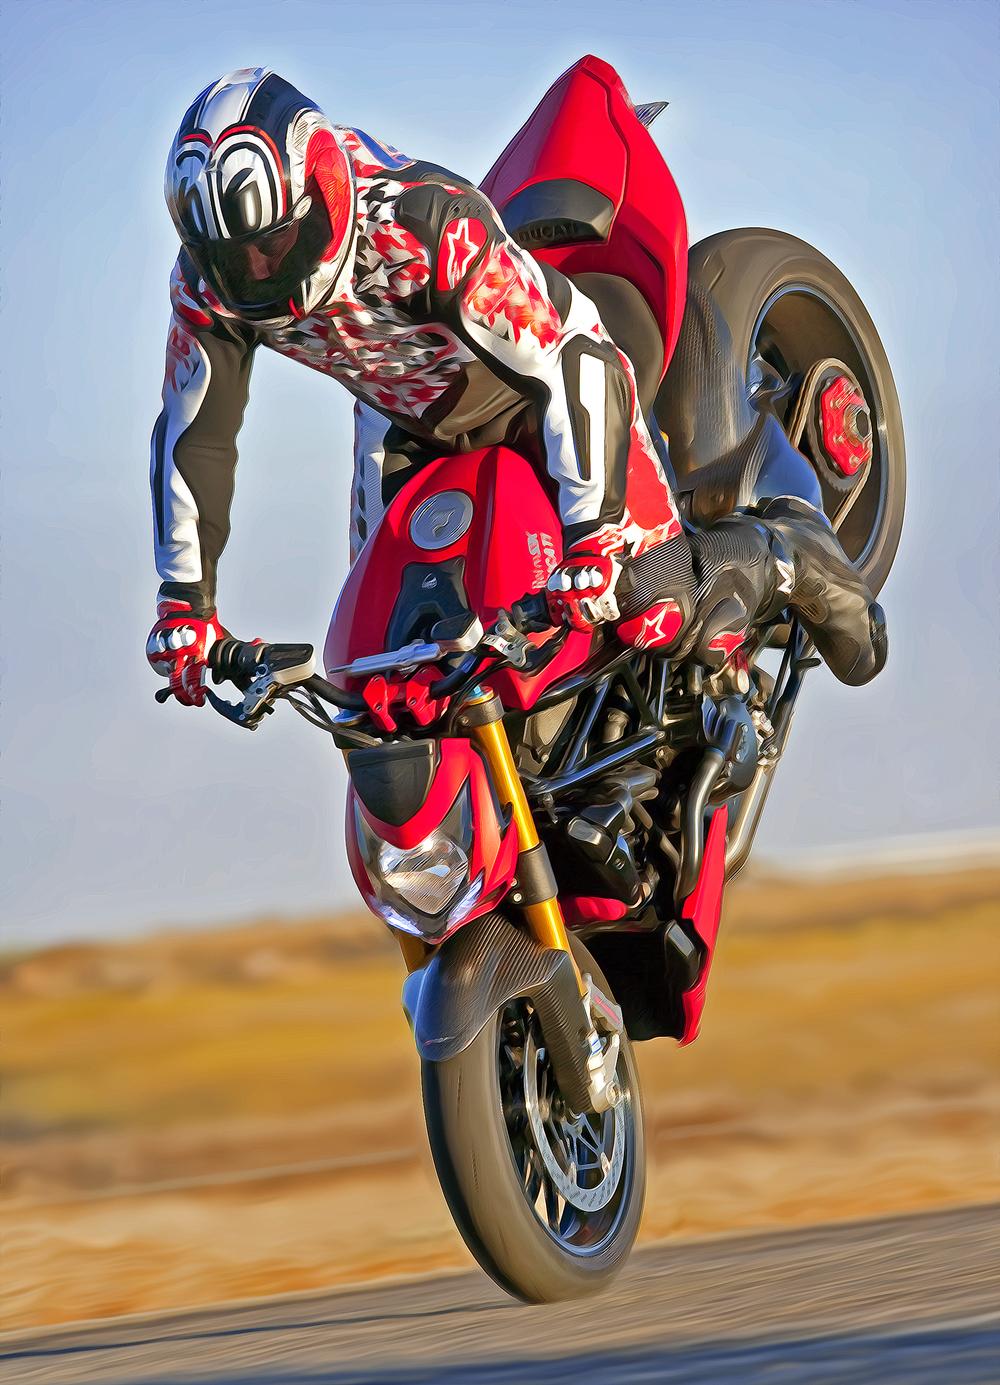 Retro SBK Ducati     Rider: Cernicky